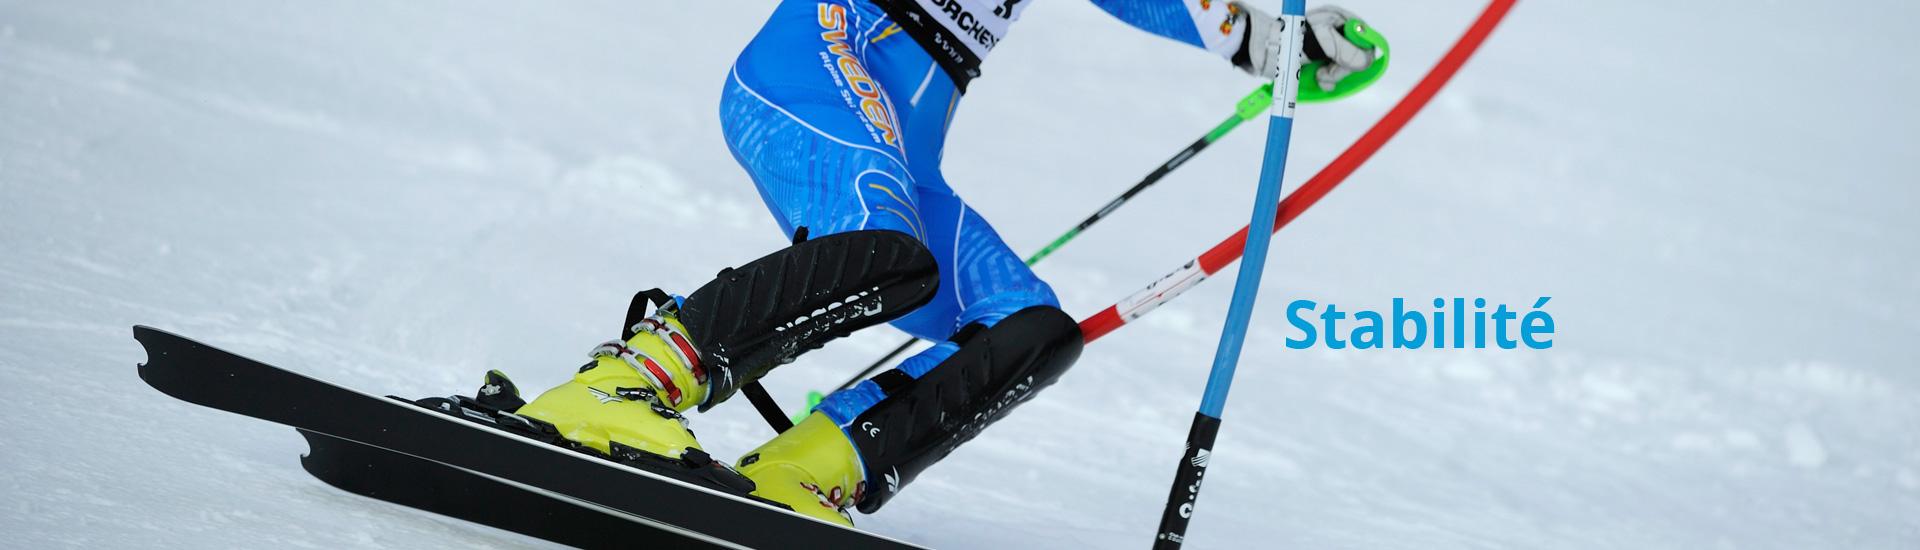 slide-ski-1